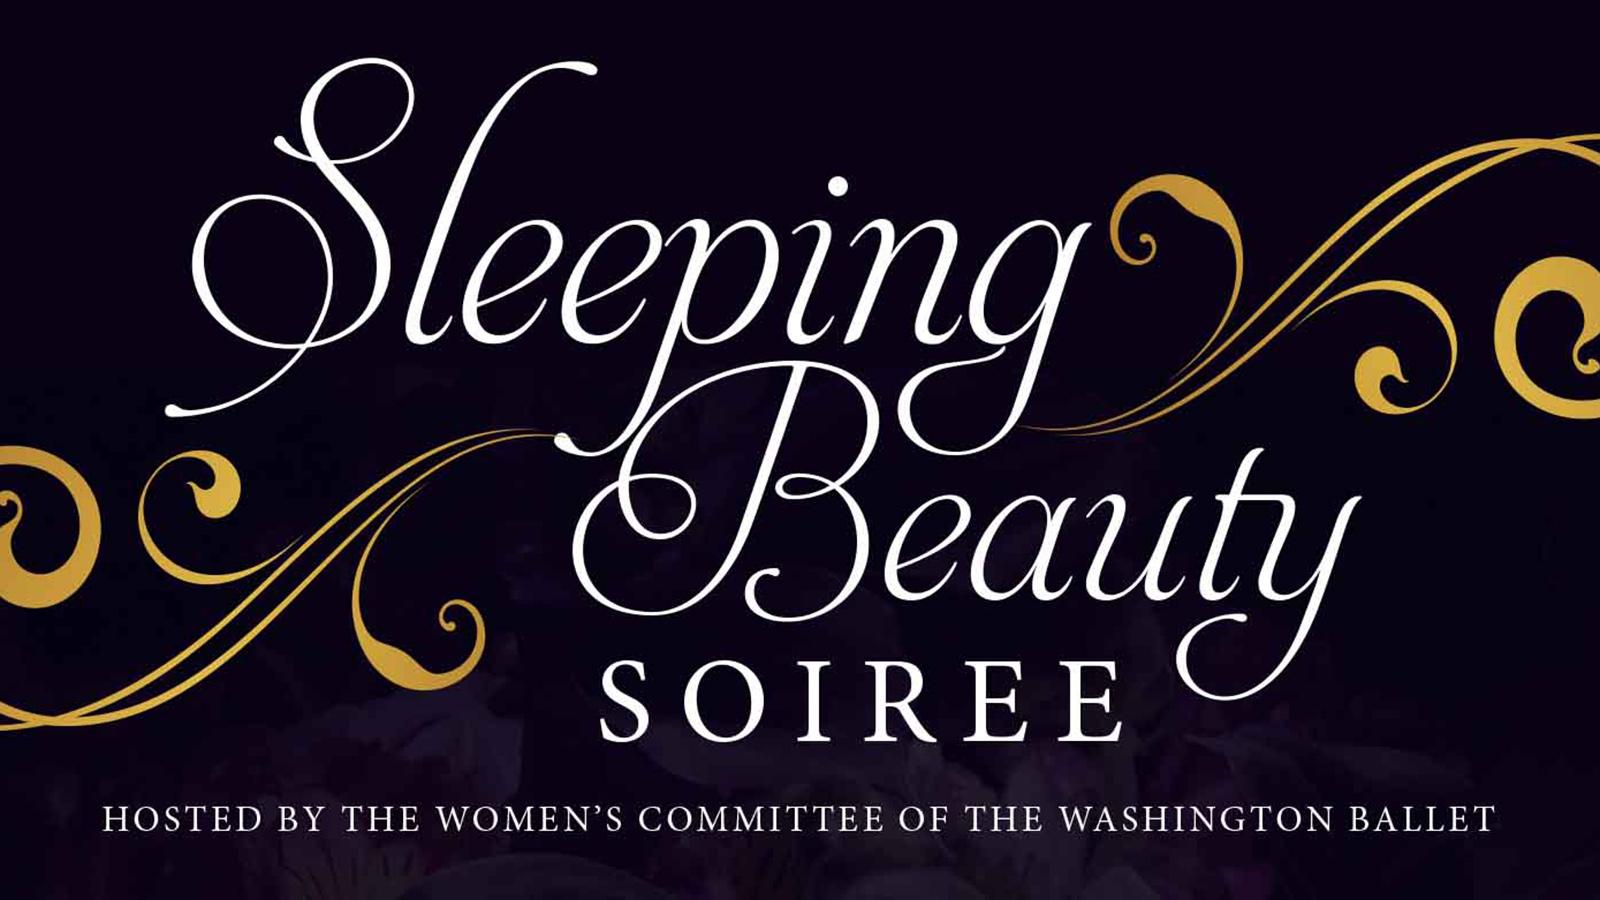 Sleeping Beauty Soiree